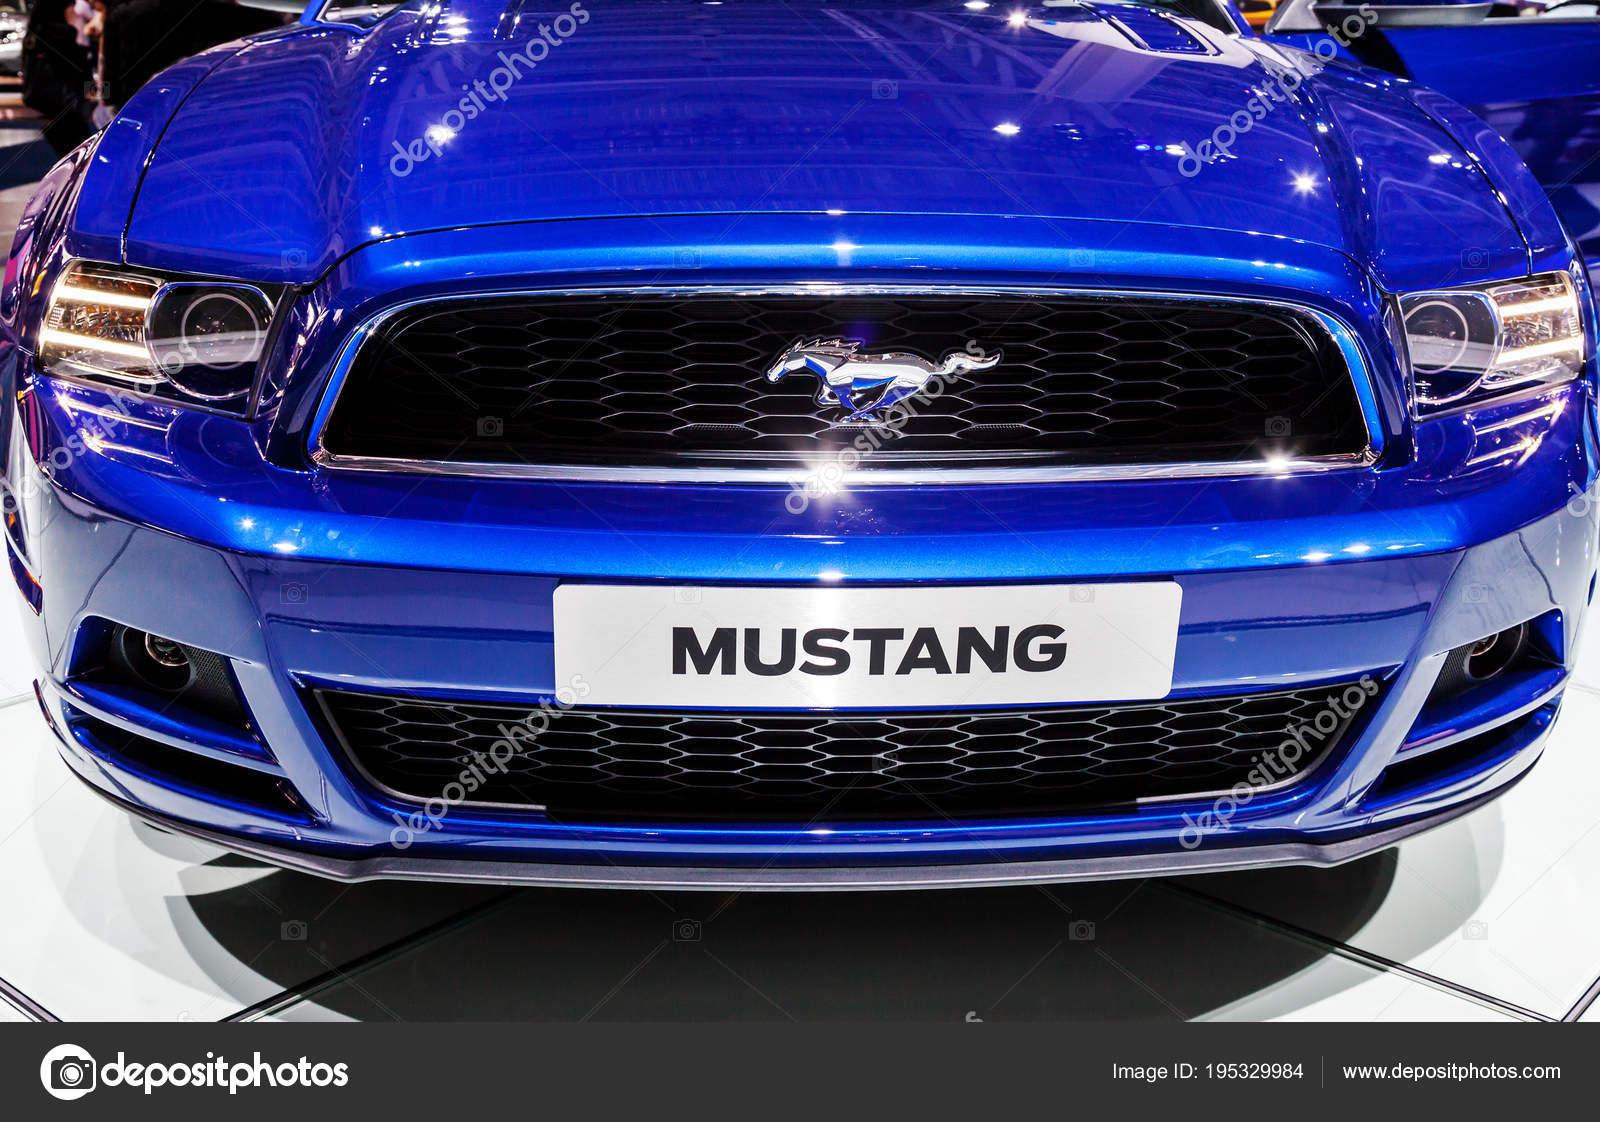 91999a334a3 Mustang auta emblém a logem značky - Stock Editorial Foto © maxoidos ...